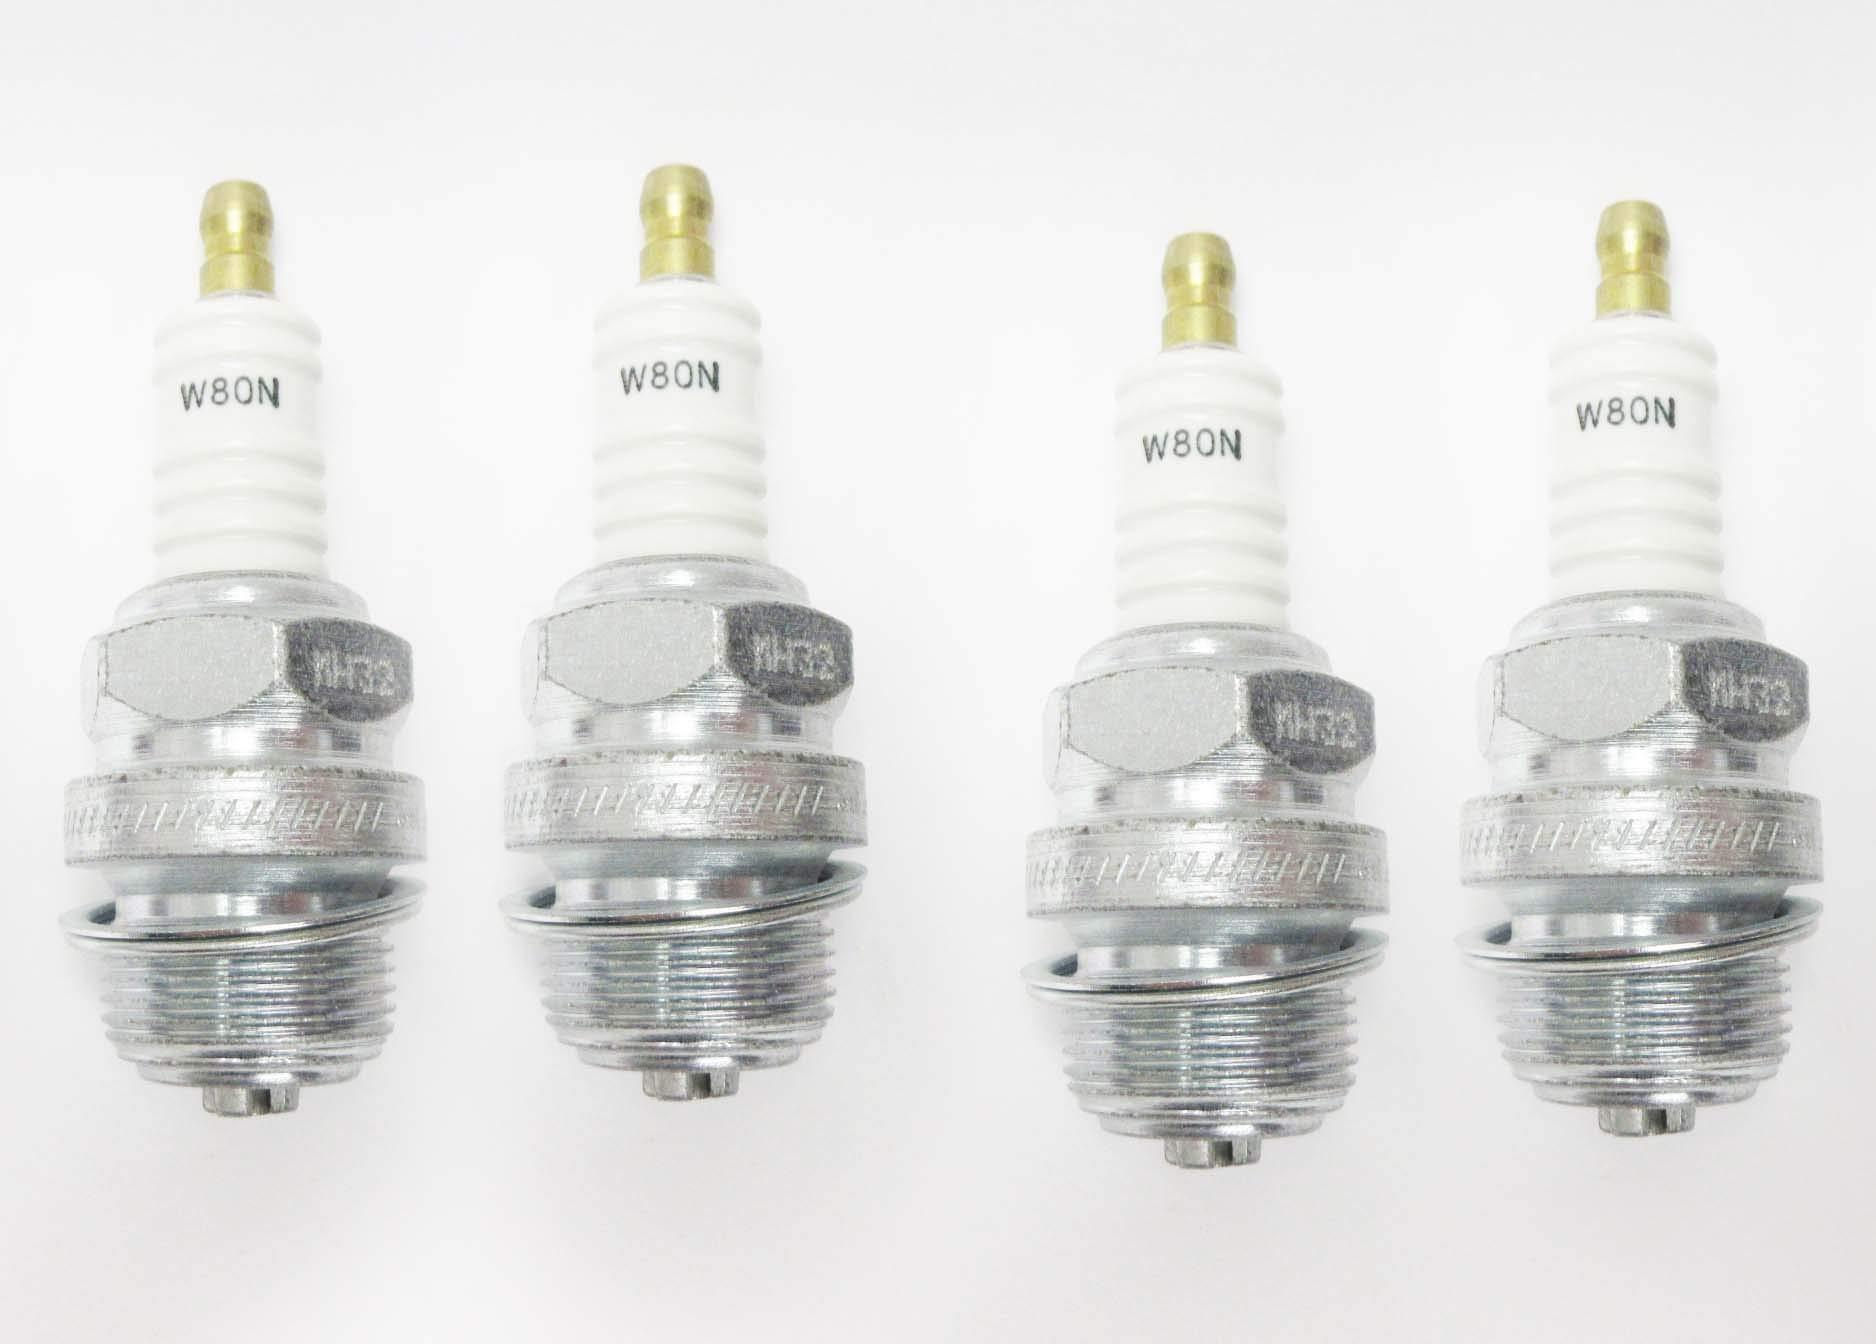 Champion 202 W80N Industrial Spark Plug Pack of 4